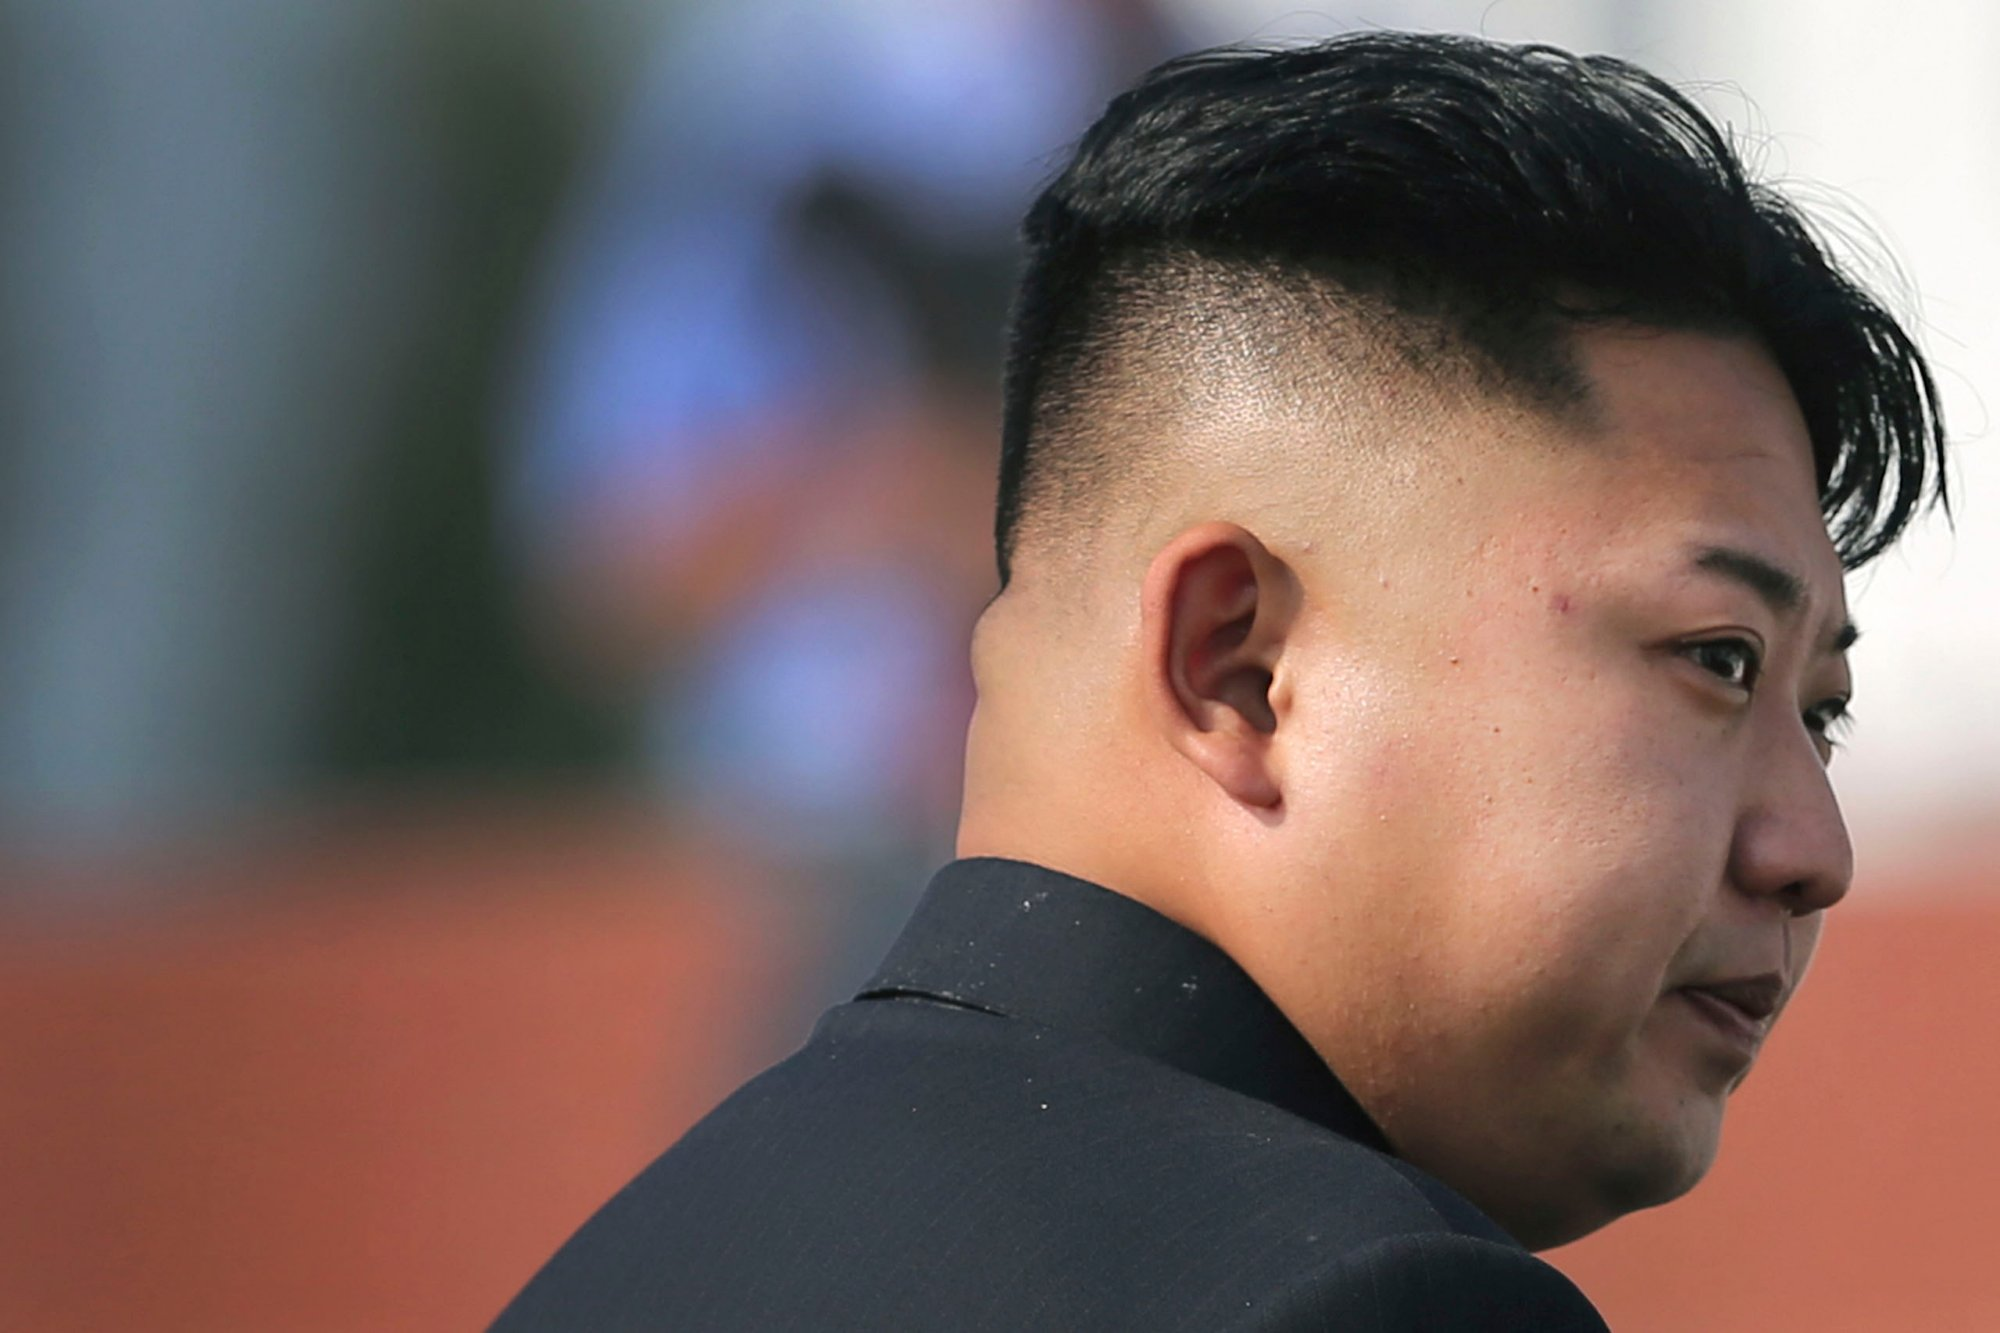 Kuzey Kore'de erkeklere zorunlu başkan traşı!..